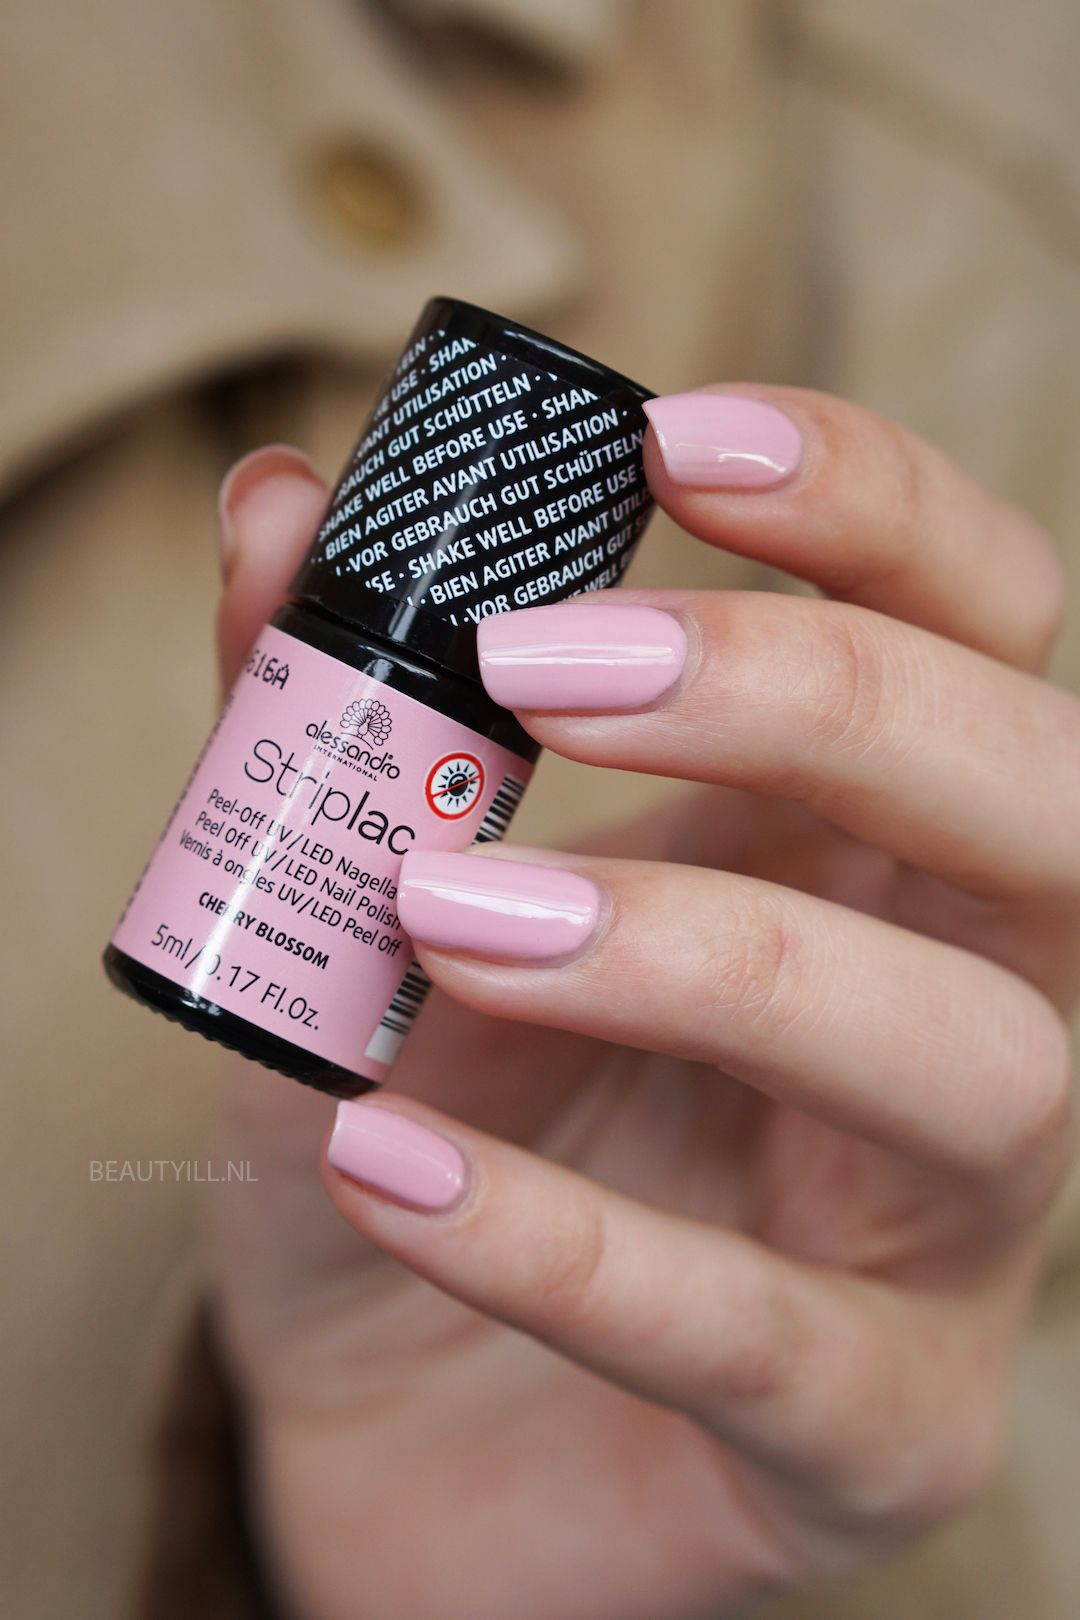 Cherry Blossom | Alessandro | Pinterest | Swatch